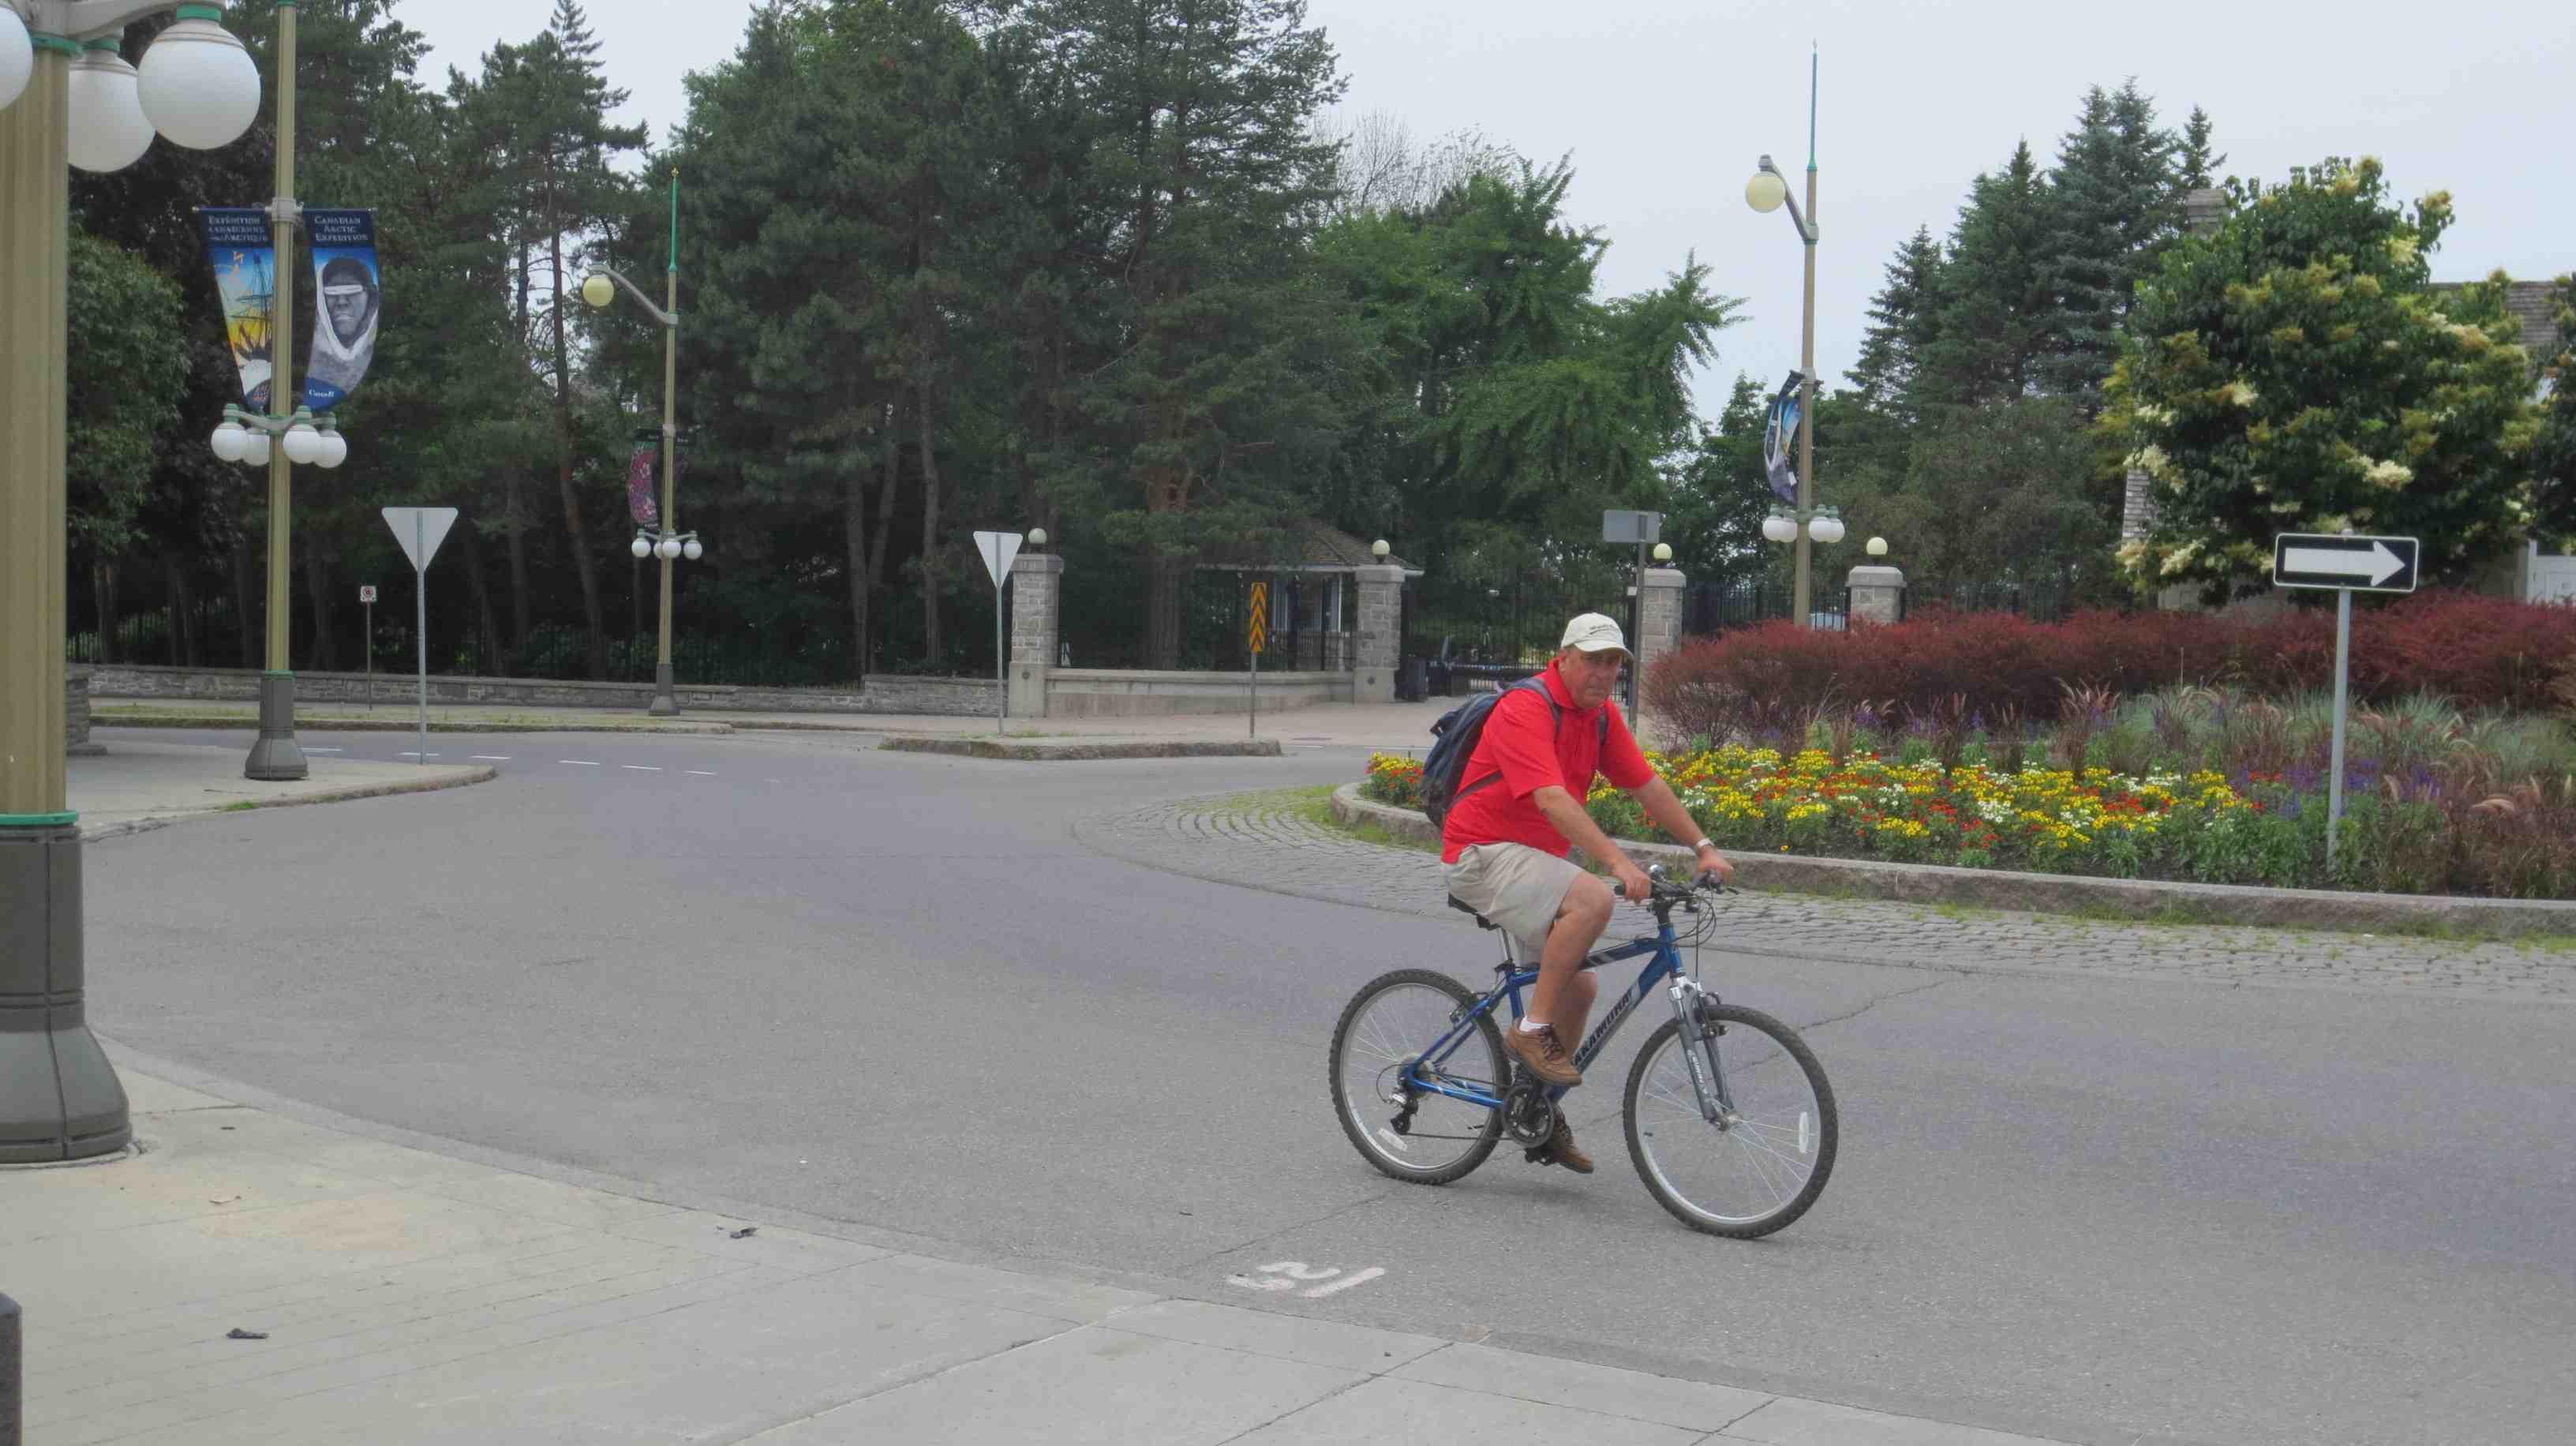 2013 07 01 Bike Ottawa Canada Day 14